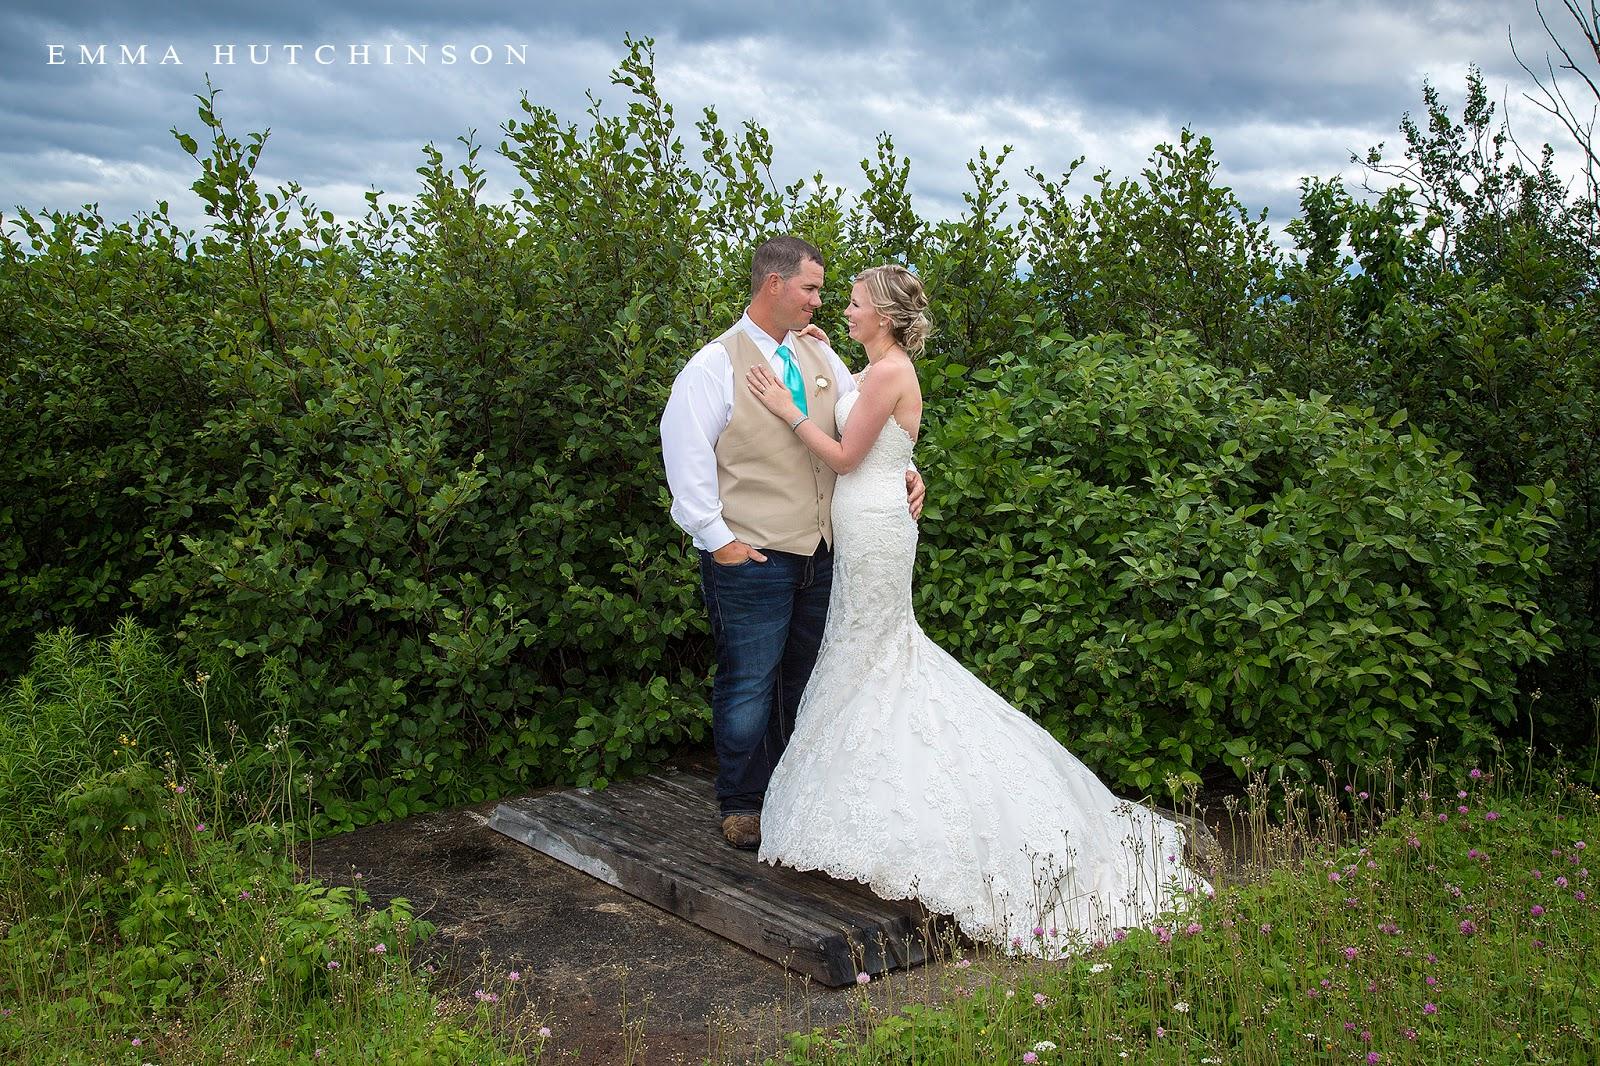 Emma Hutchinson Photography - Newfoundland backyard wedding photography